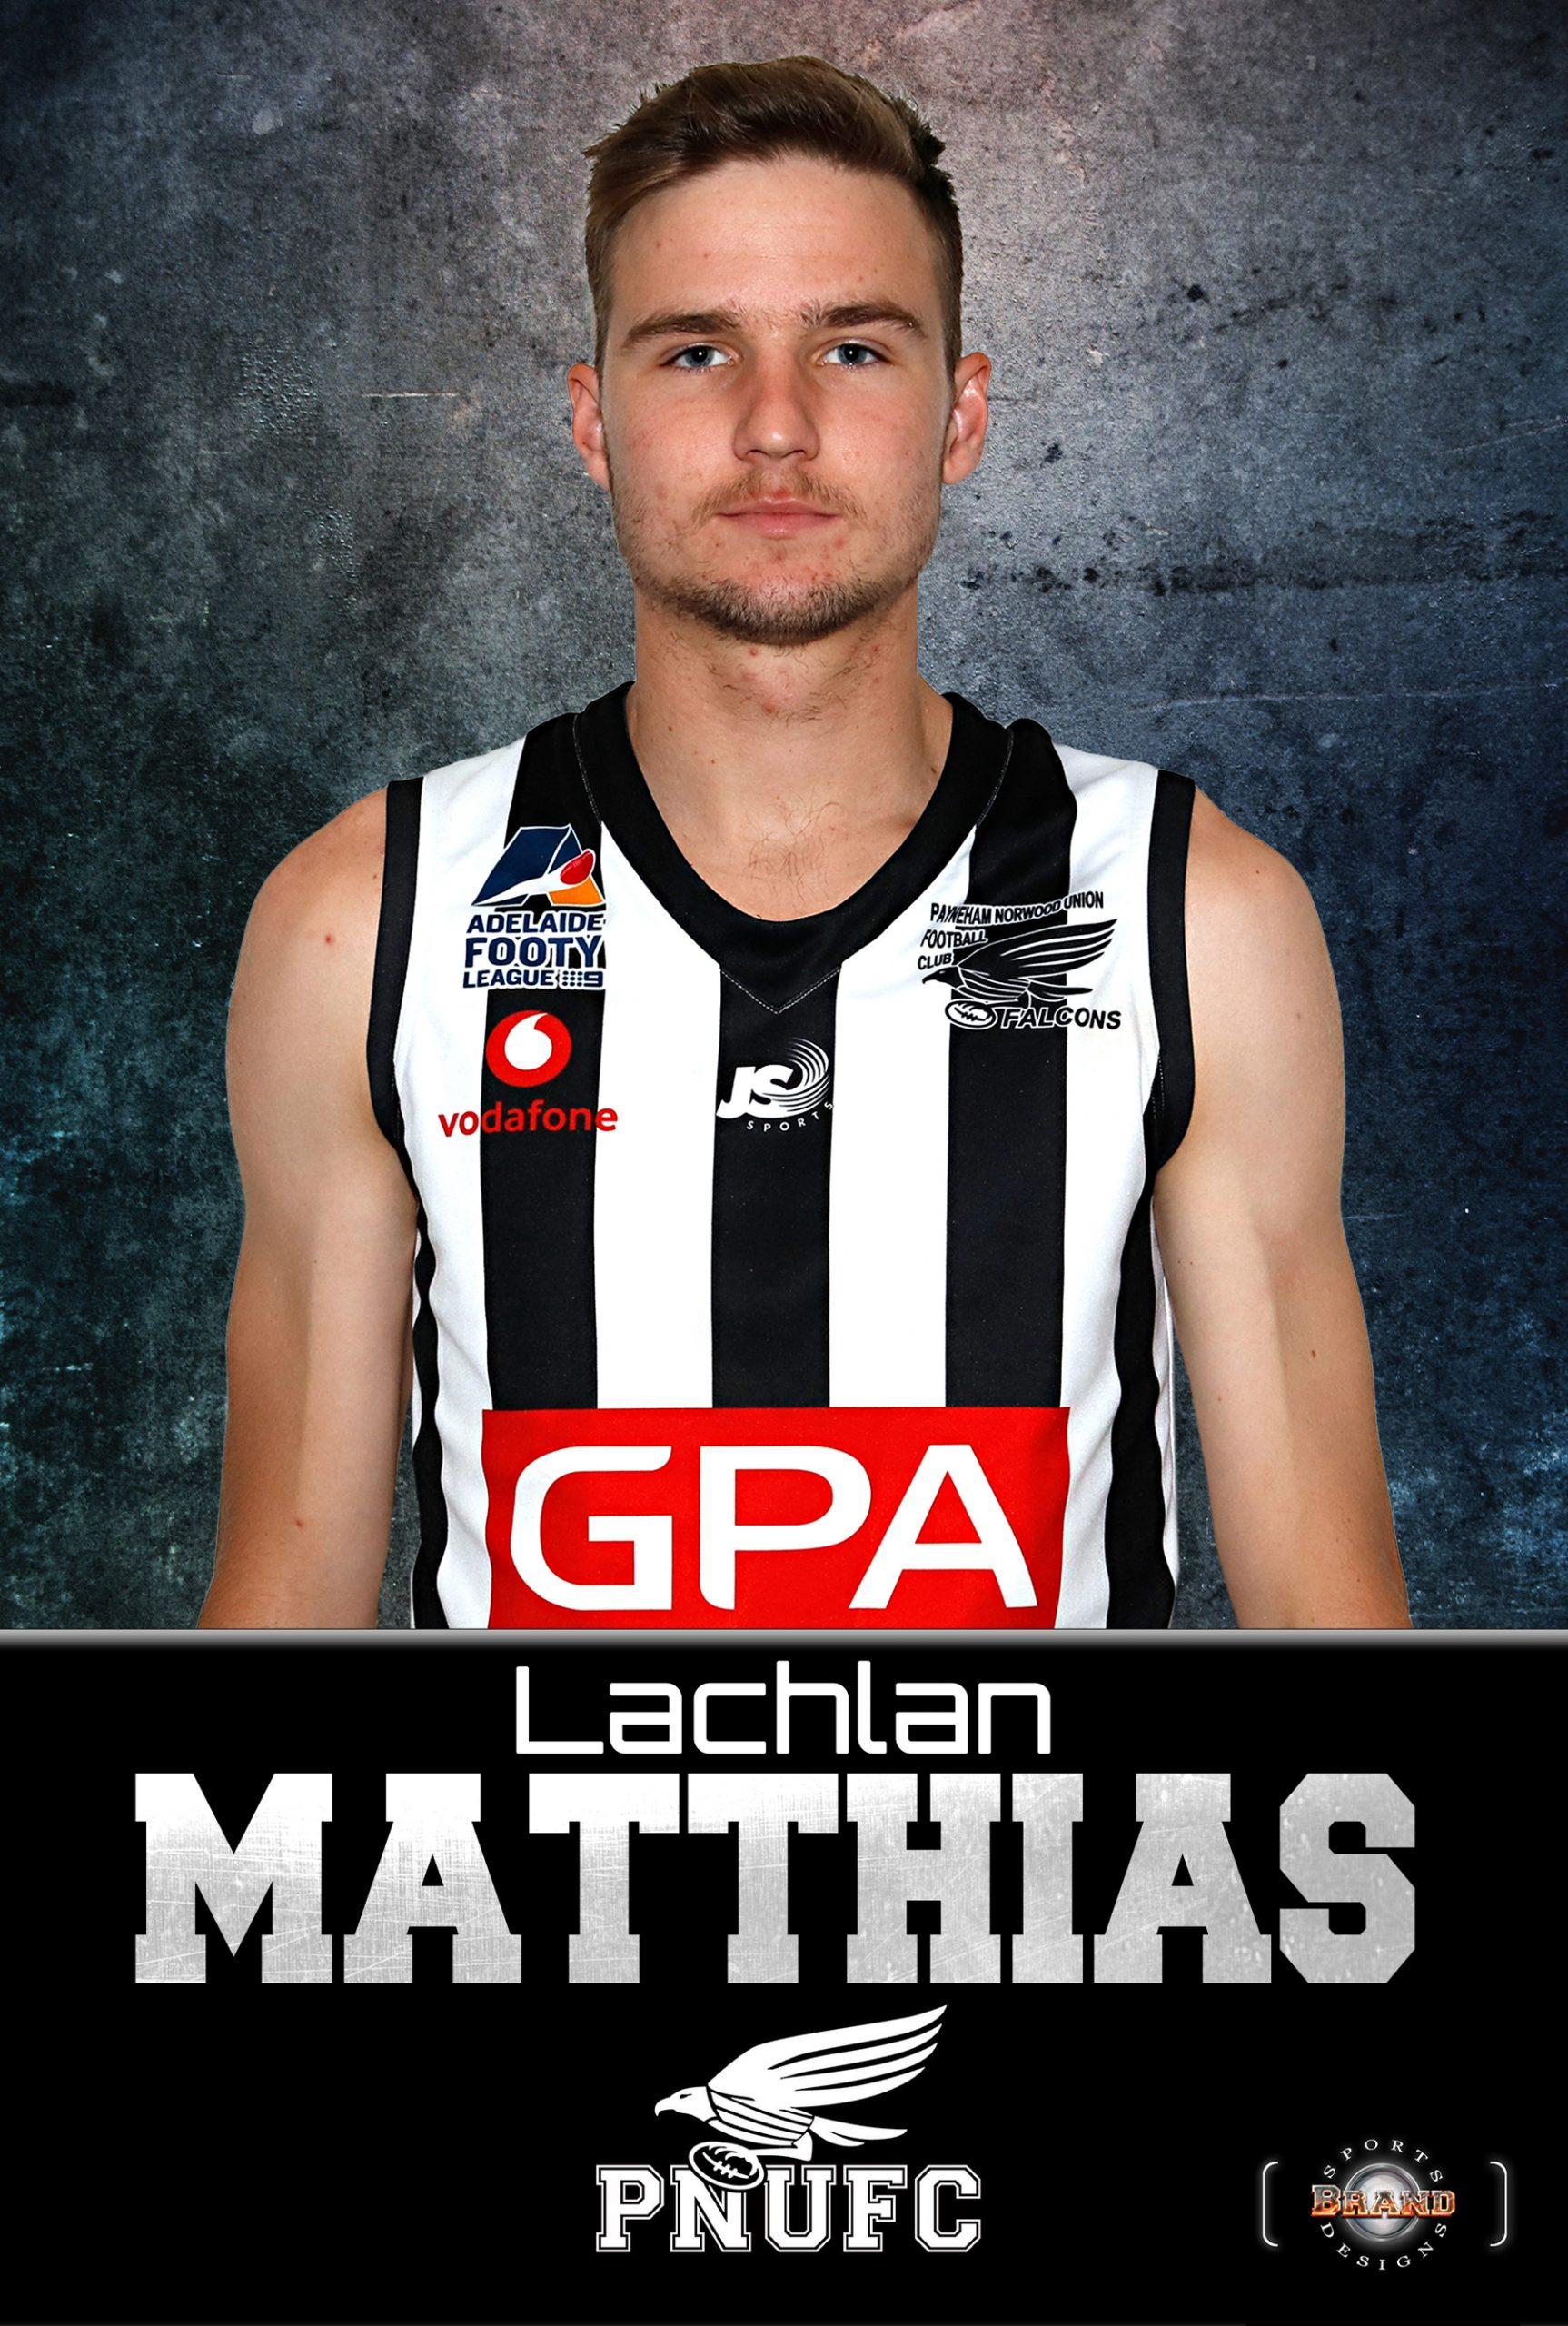 Lachlan Matthias